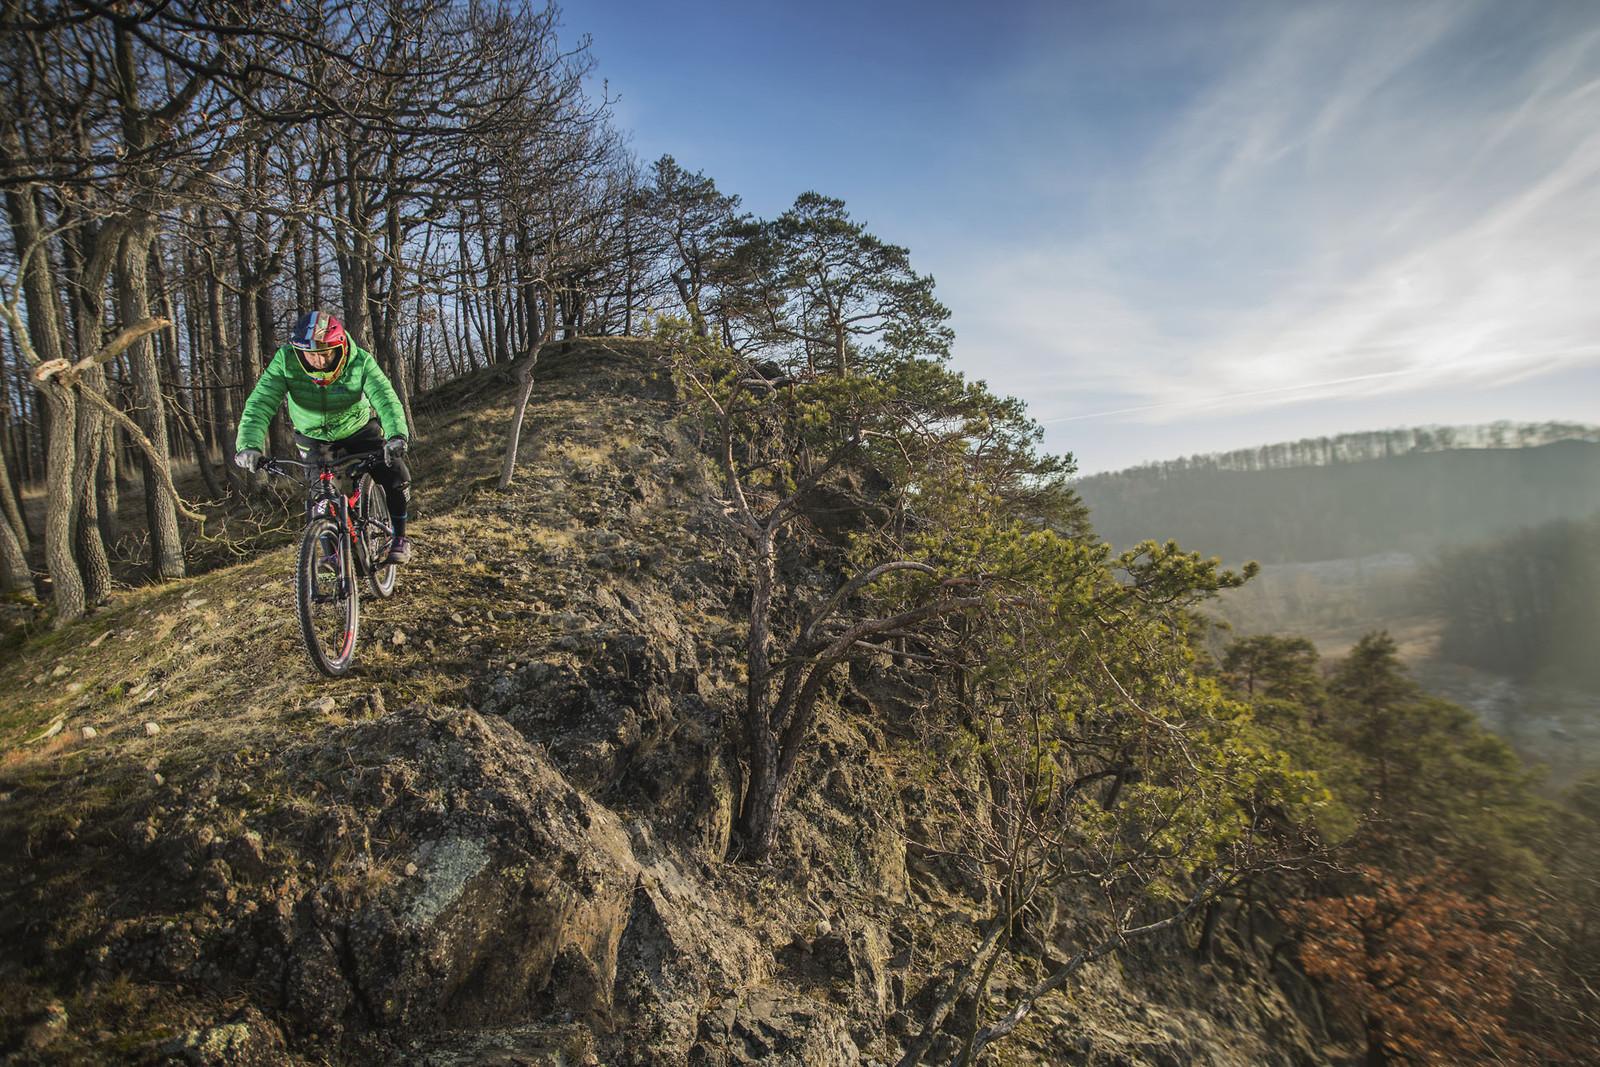 Ridge Trail - Piotr_Szwed Szwedowski - Mountain Biking Pictures - Vital MTB